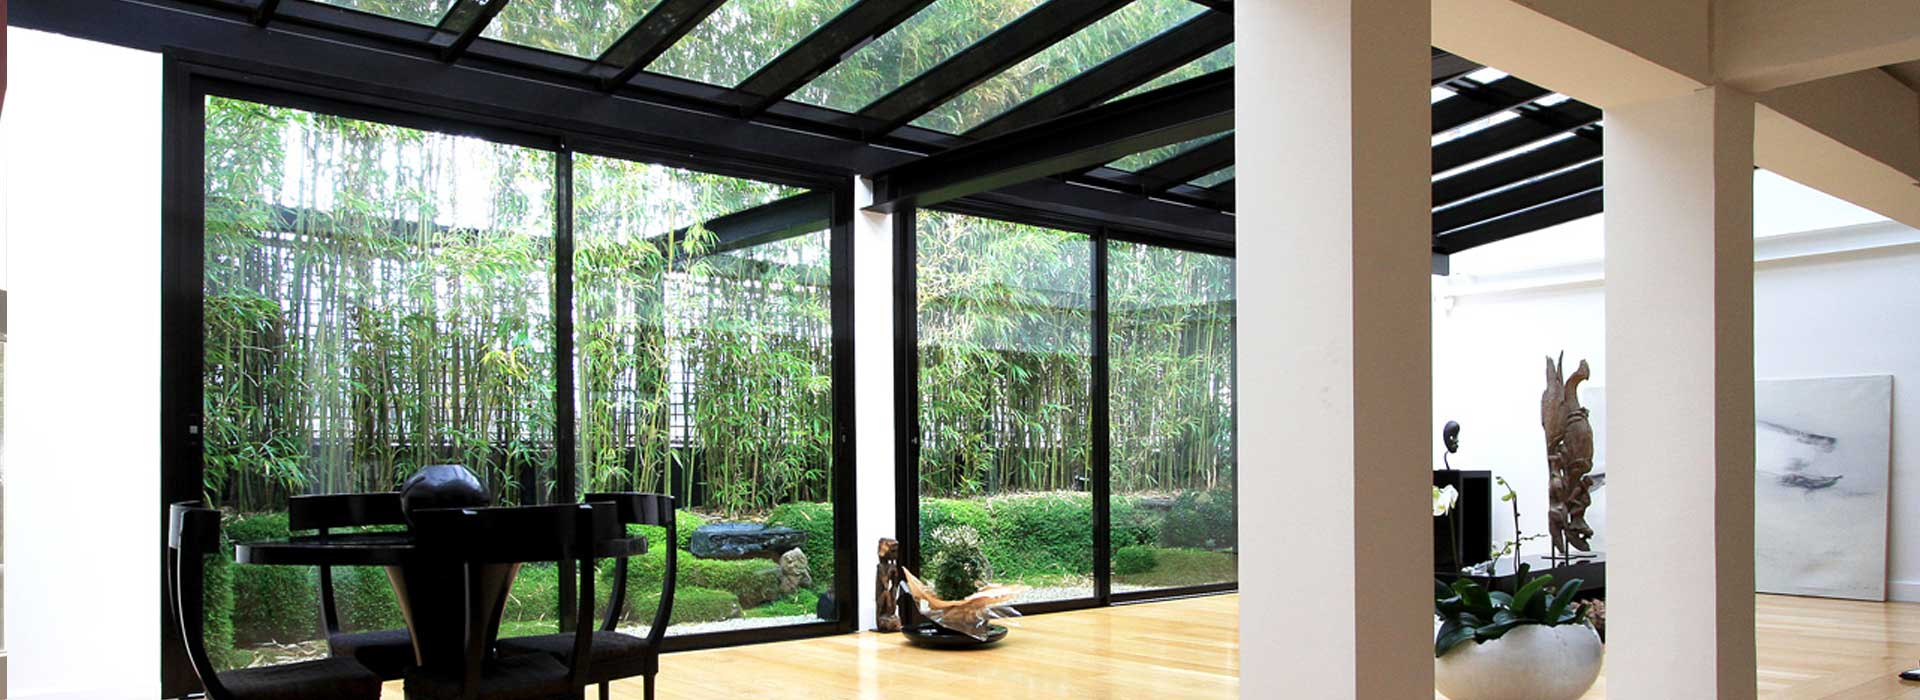 v randa design une nouvelle extension de maison. Black Bedroom Furniture Sets. Home Design Ideas